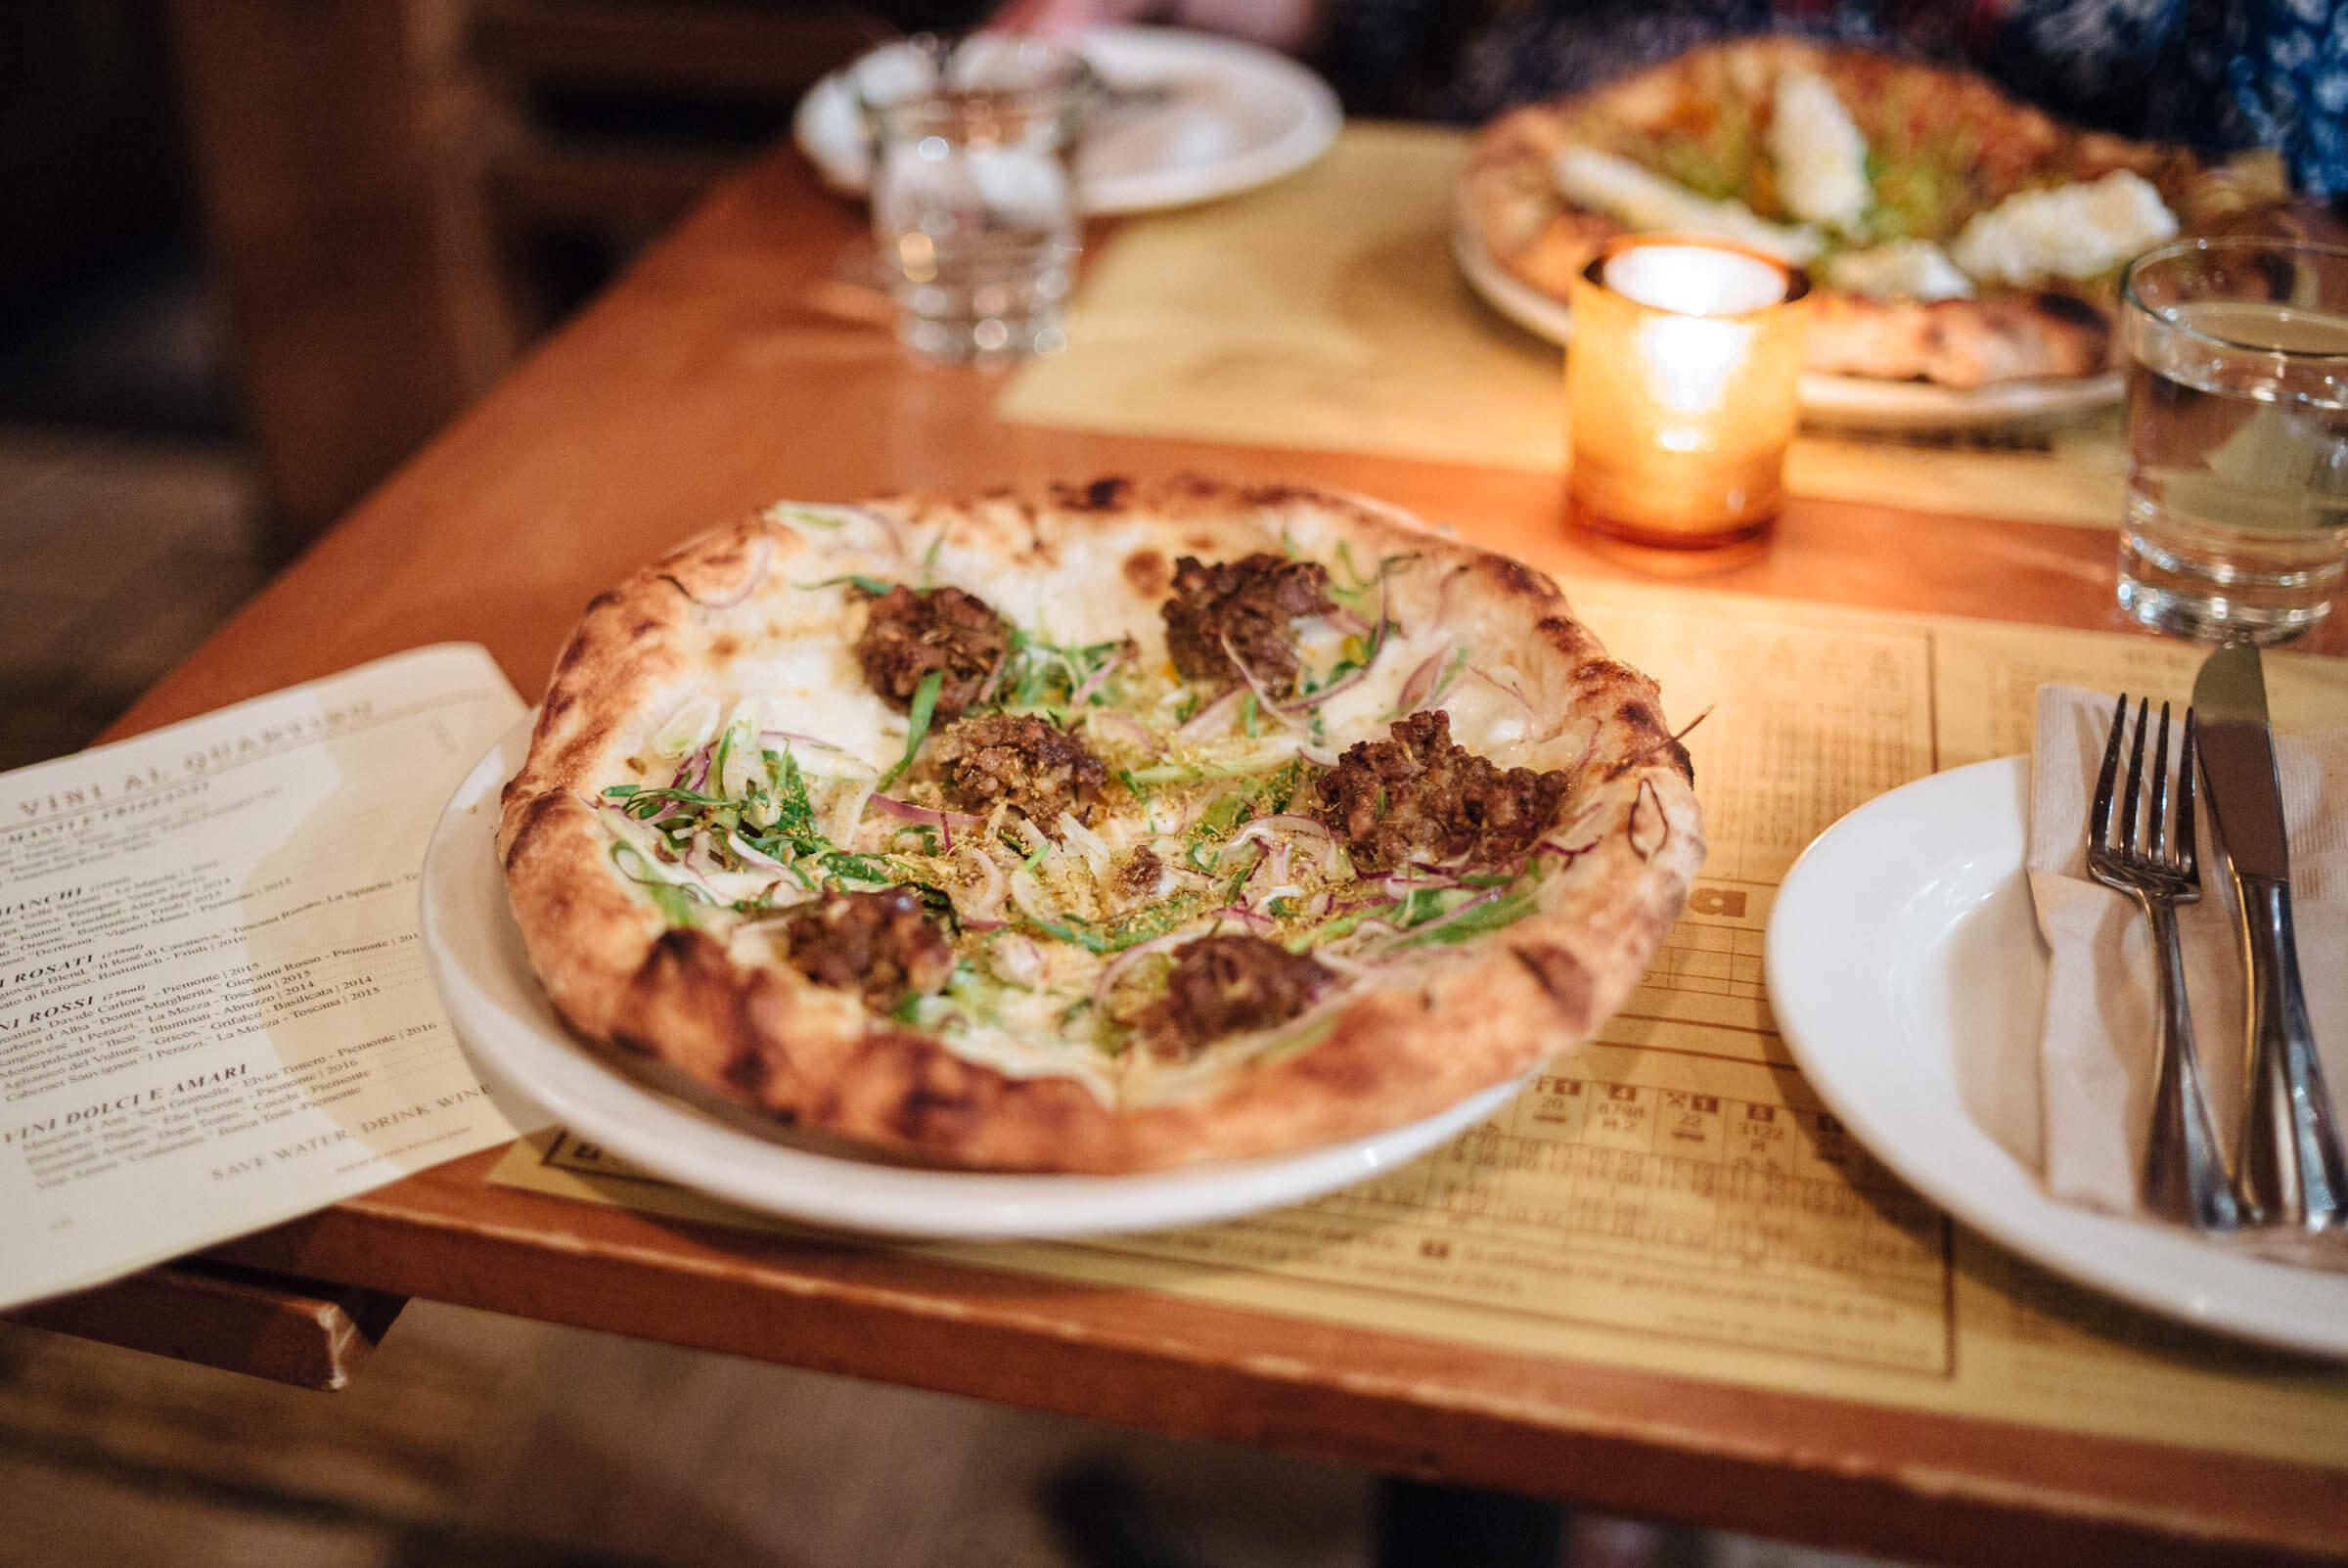 Sausage pizza at Pizzeria Mozza, West Hollywood, LA, The Taste Edit